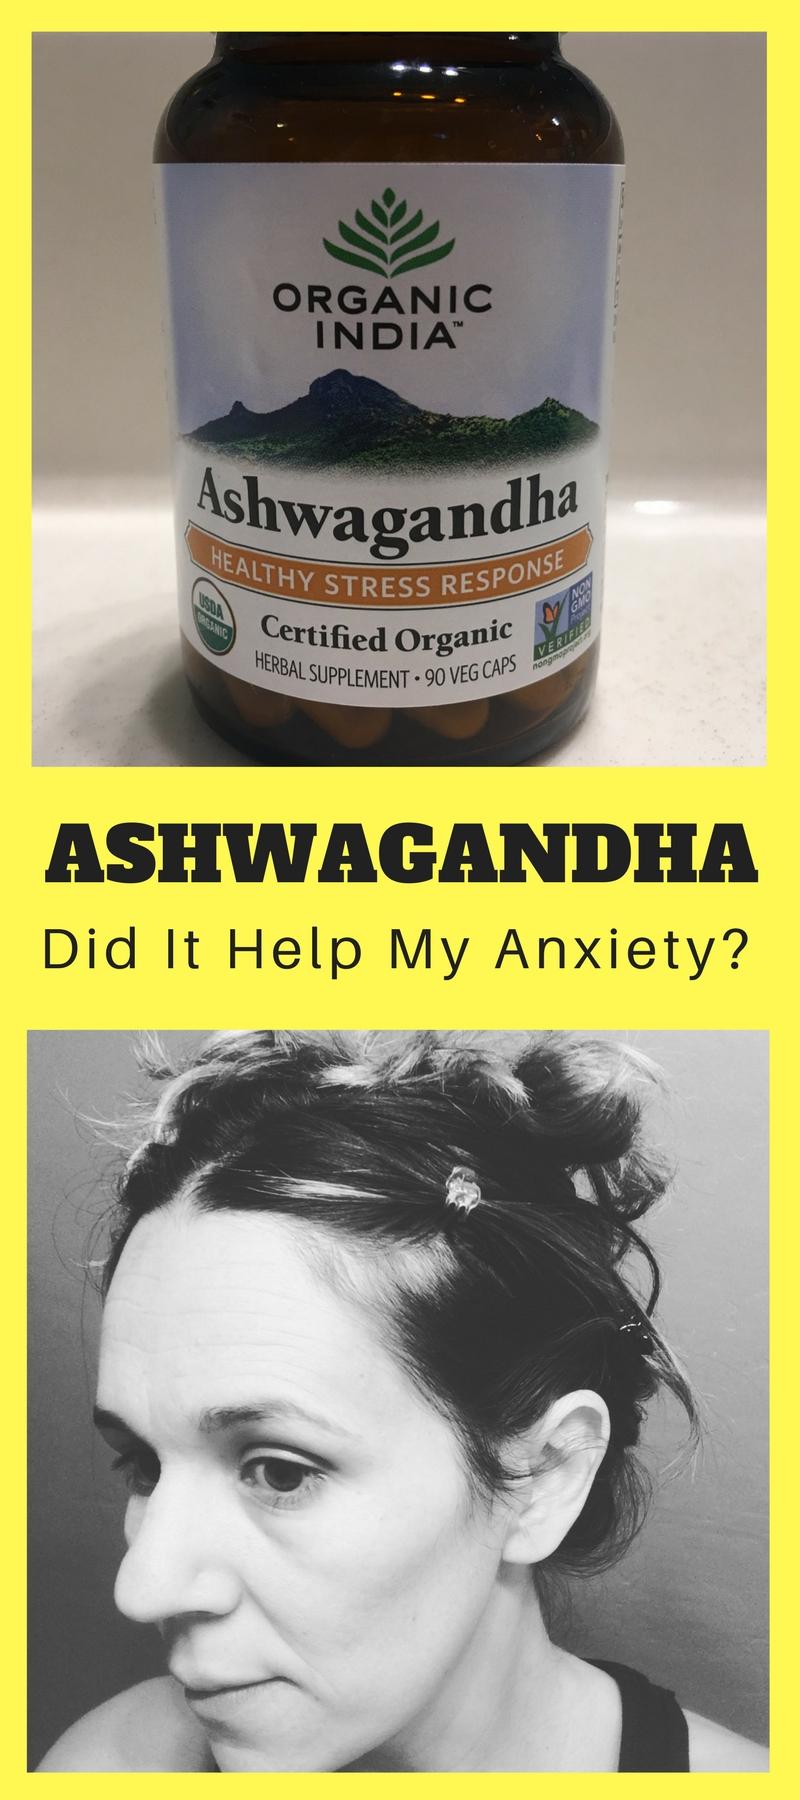 DOES ASHWAGANDHA HELP ANXIETY